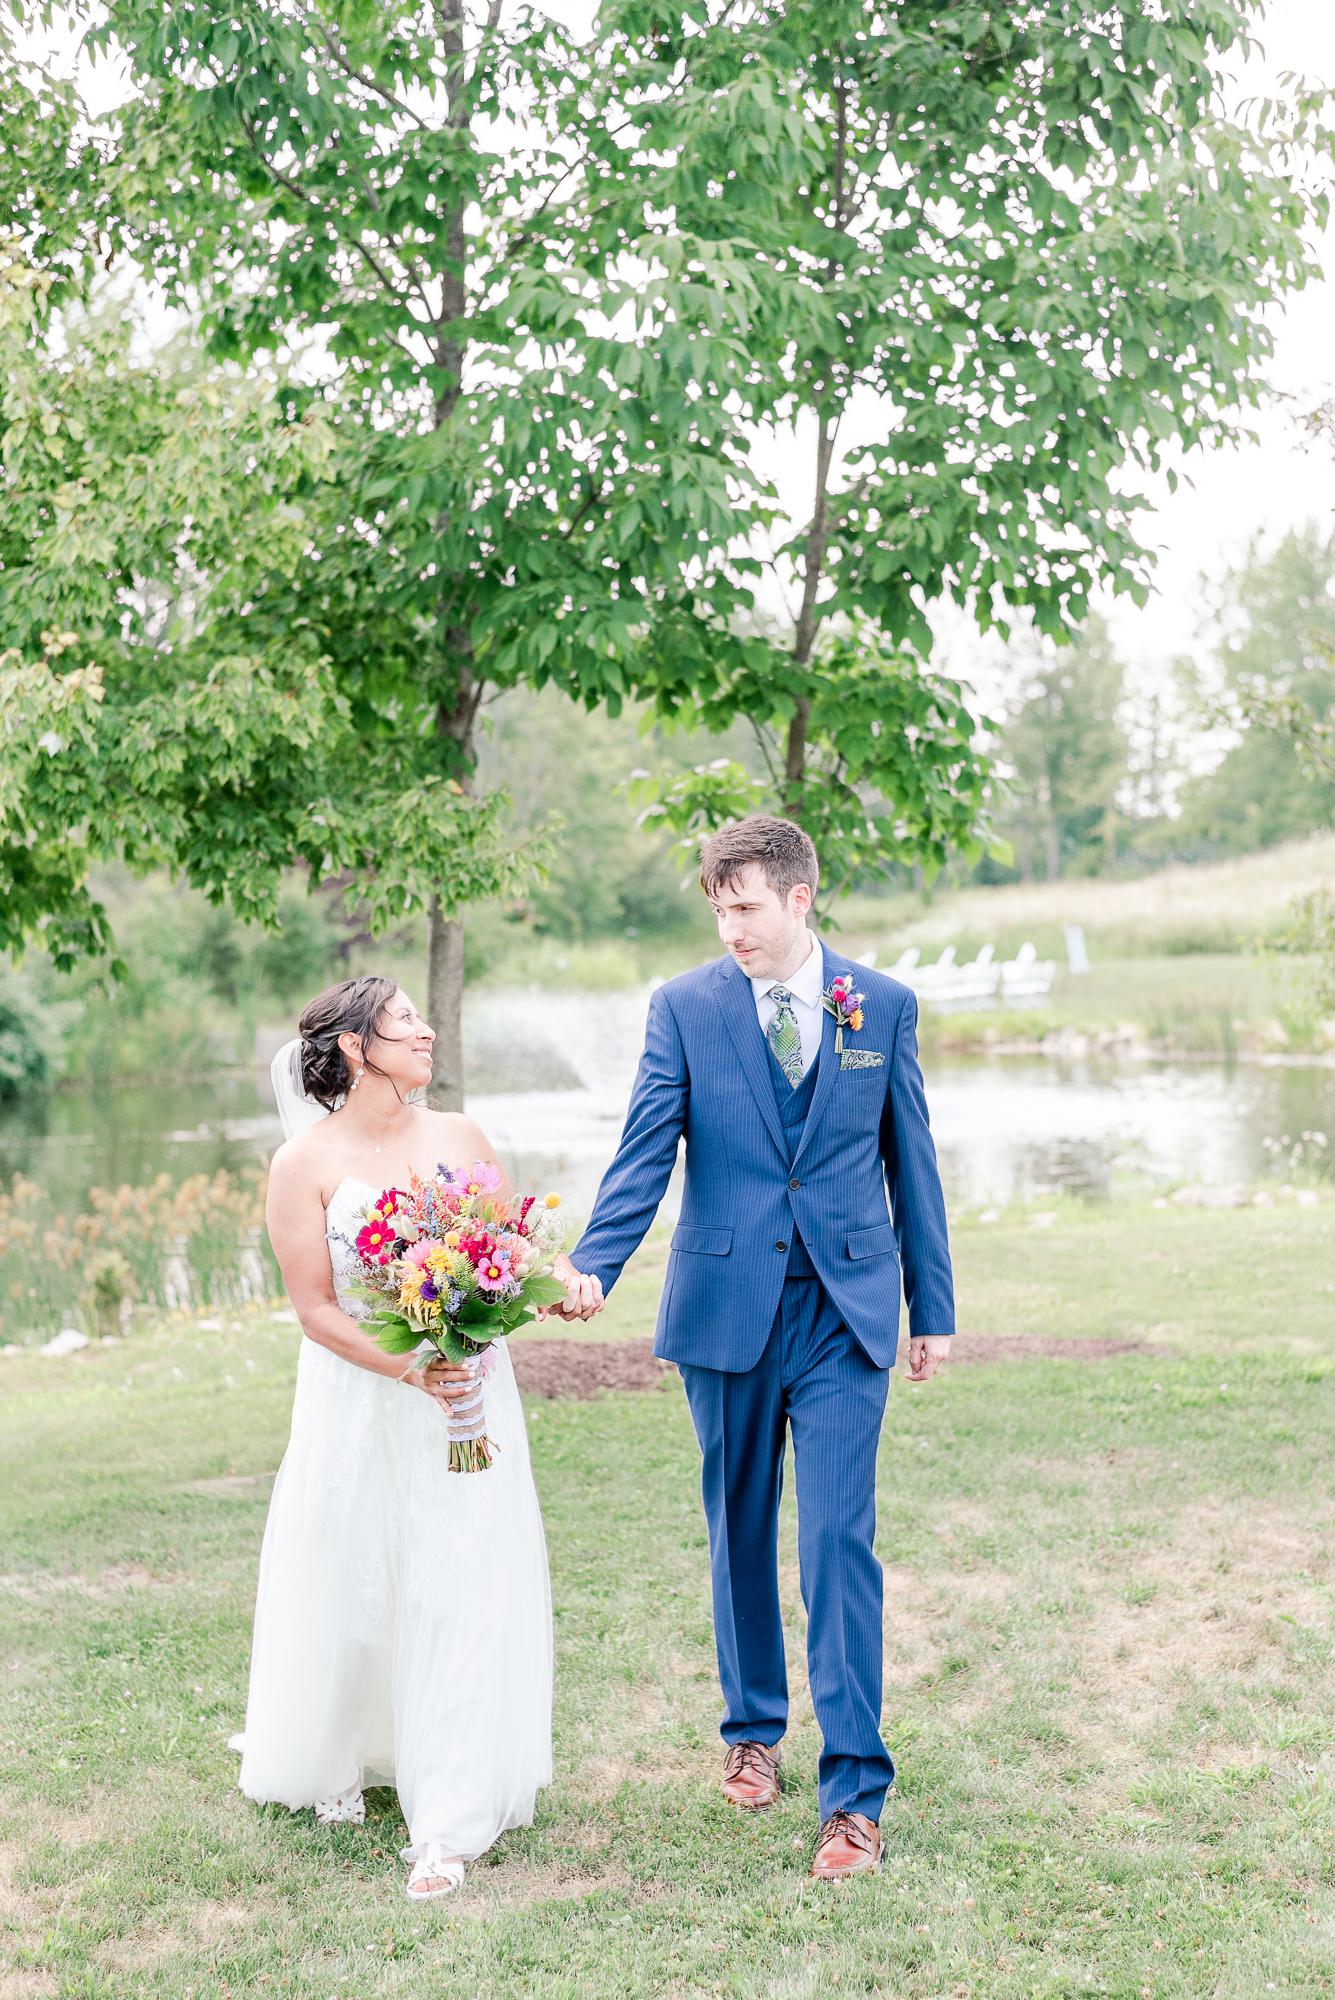 Maria+Adam_Summer Barn Wedding_The Barn and The North Star Preserve_Oberlin_Ohio-134.jpg